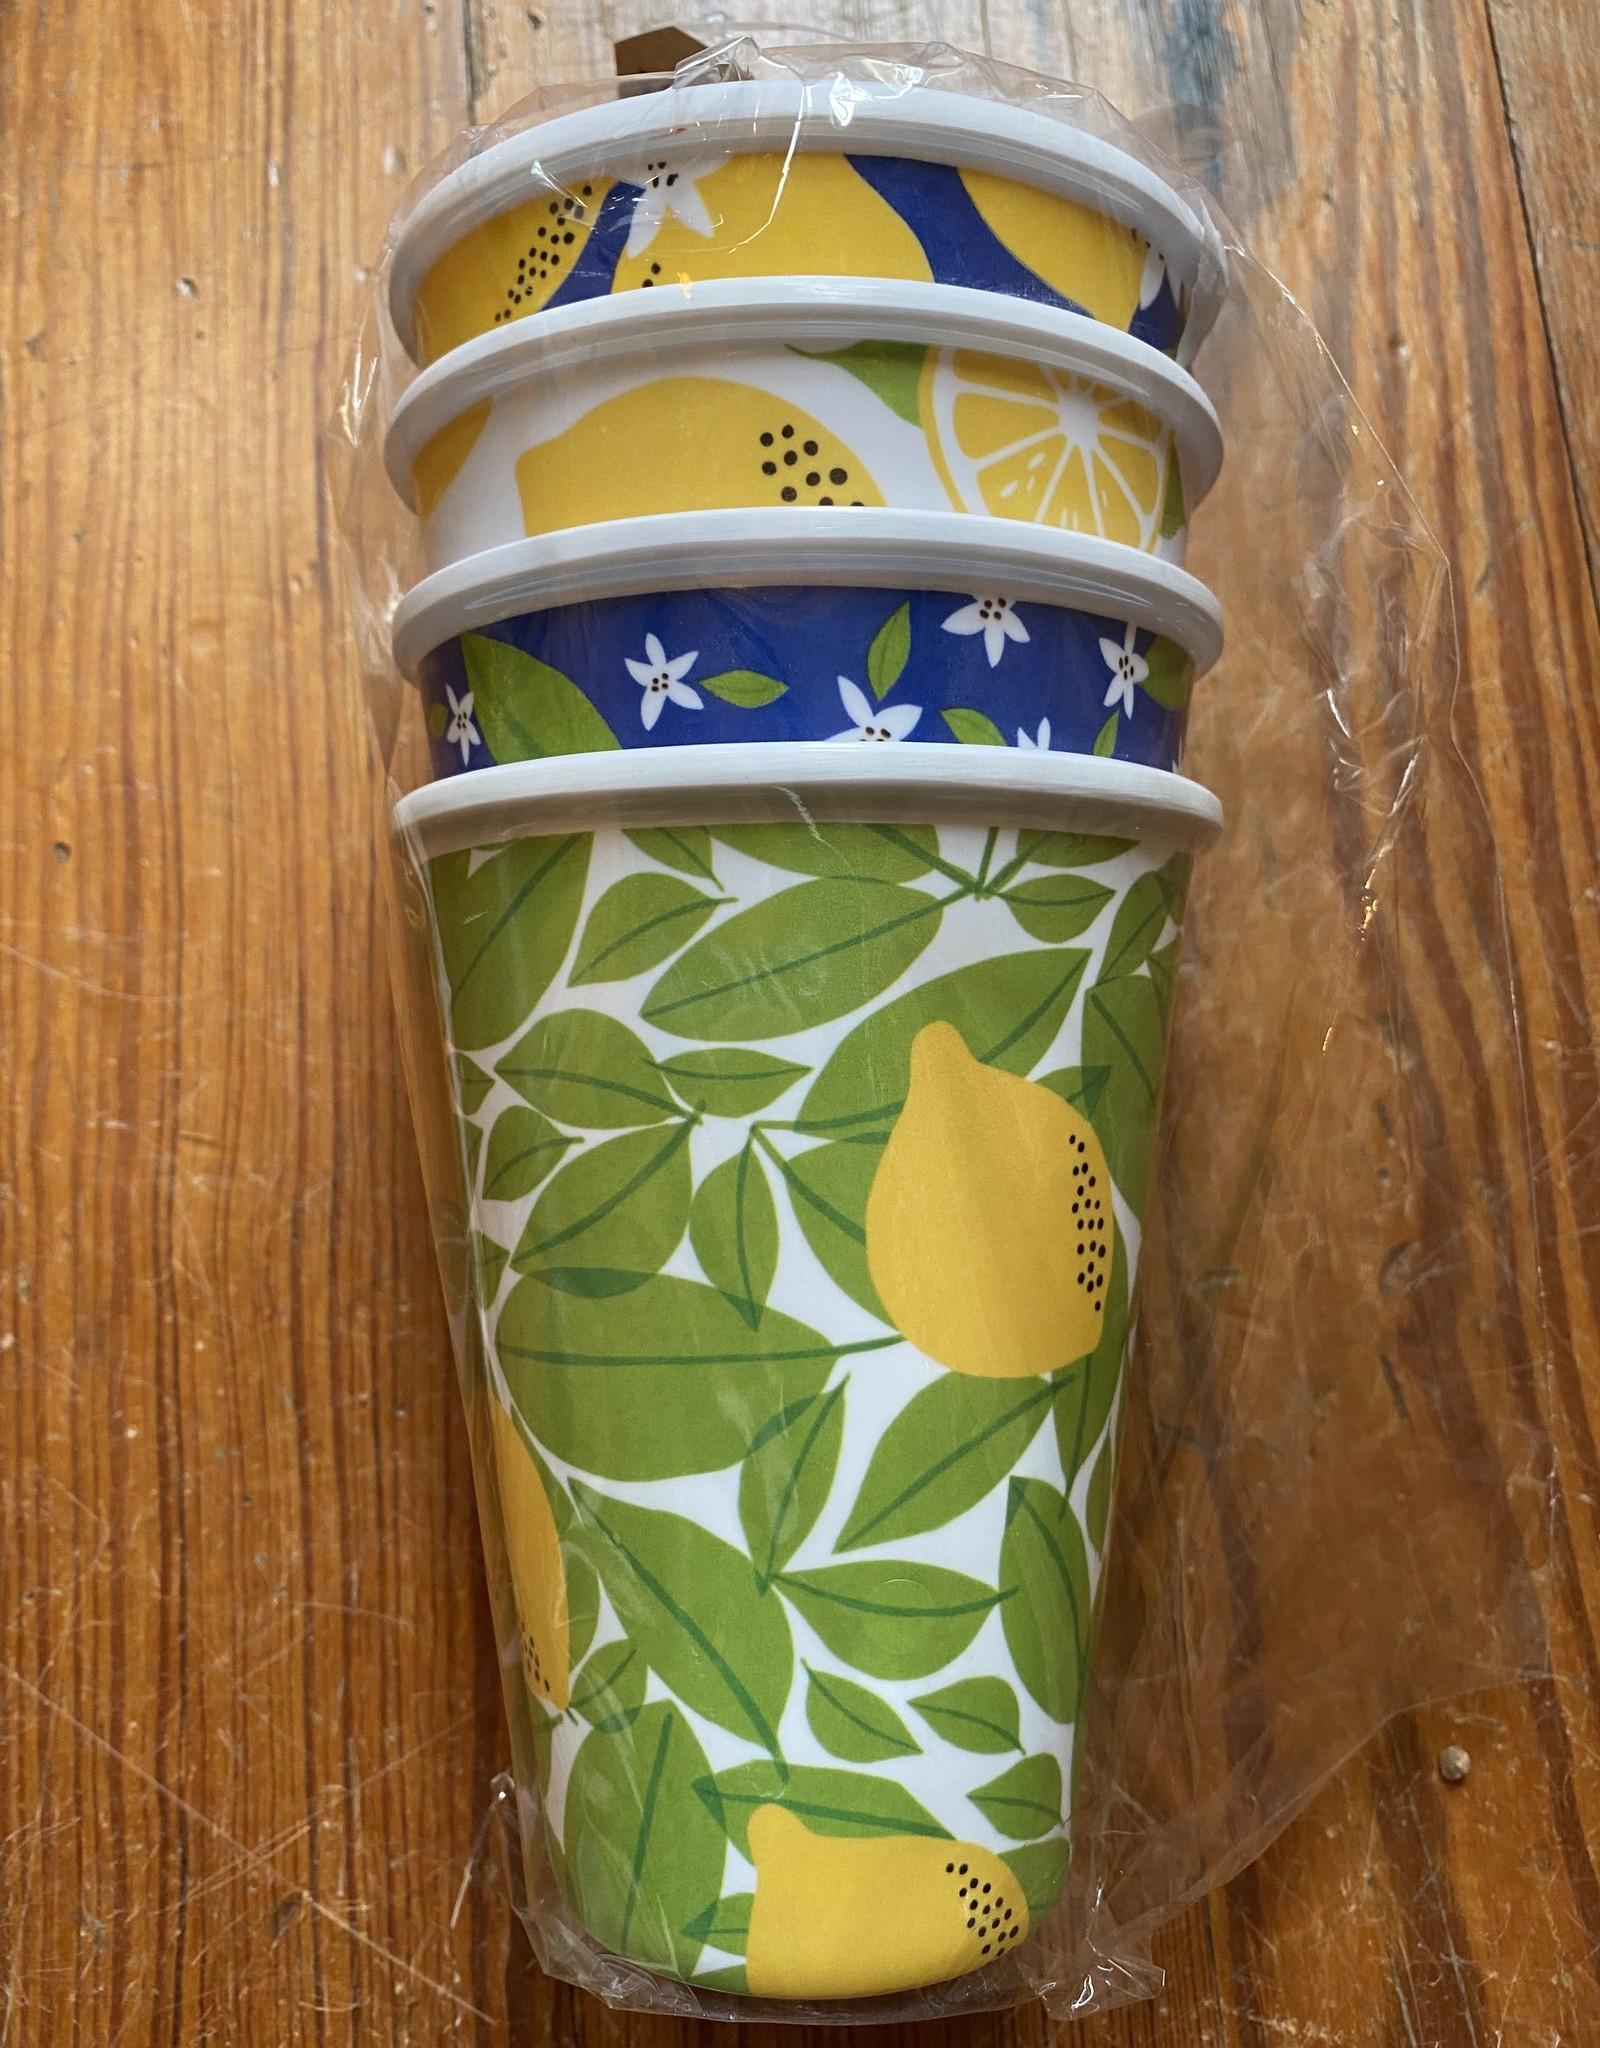 Wink Lemon Cup 4pk Melamine